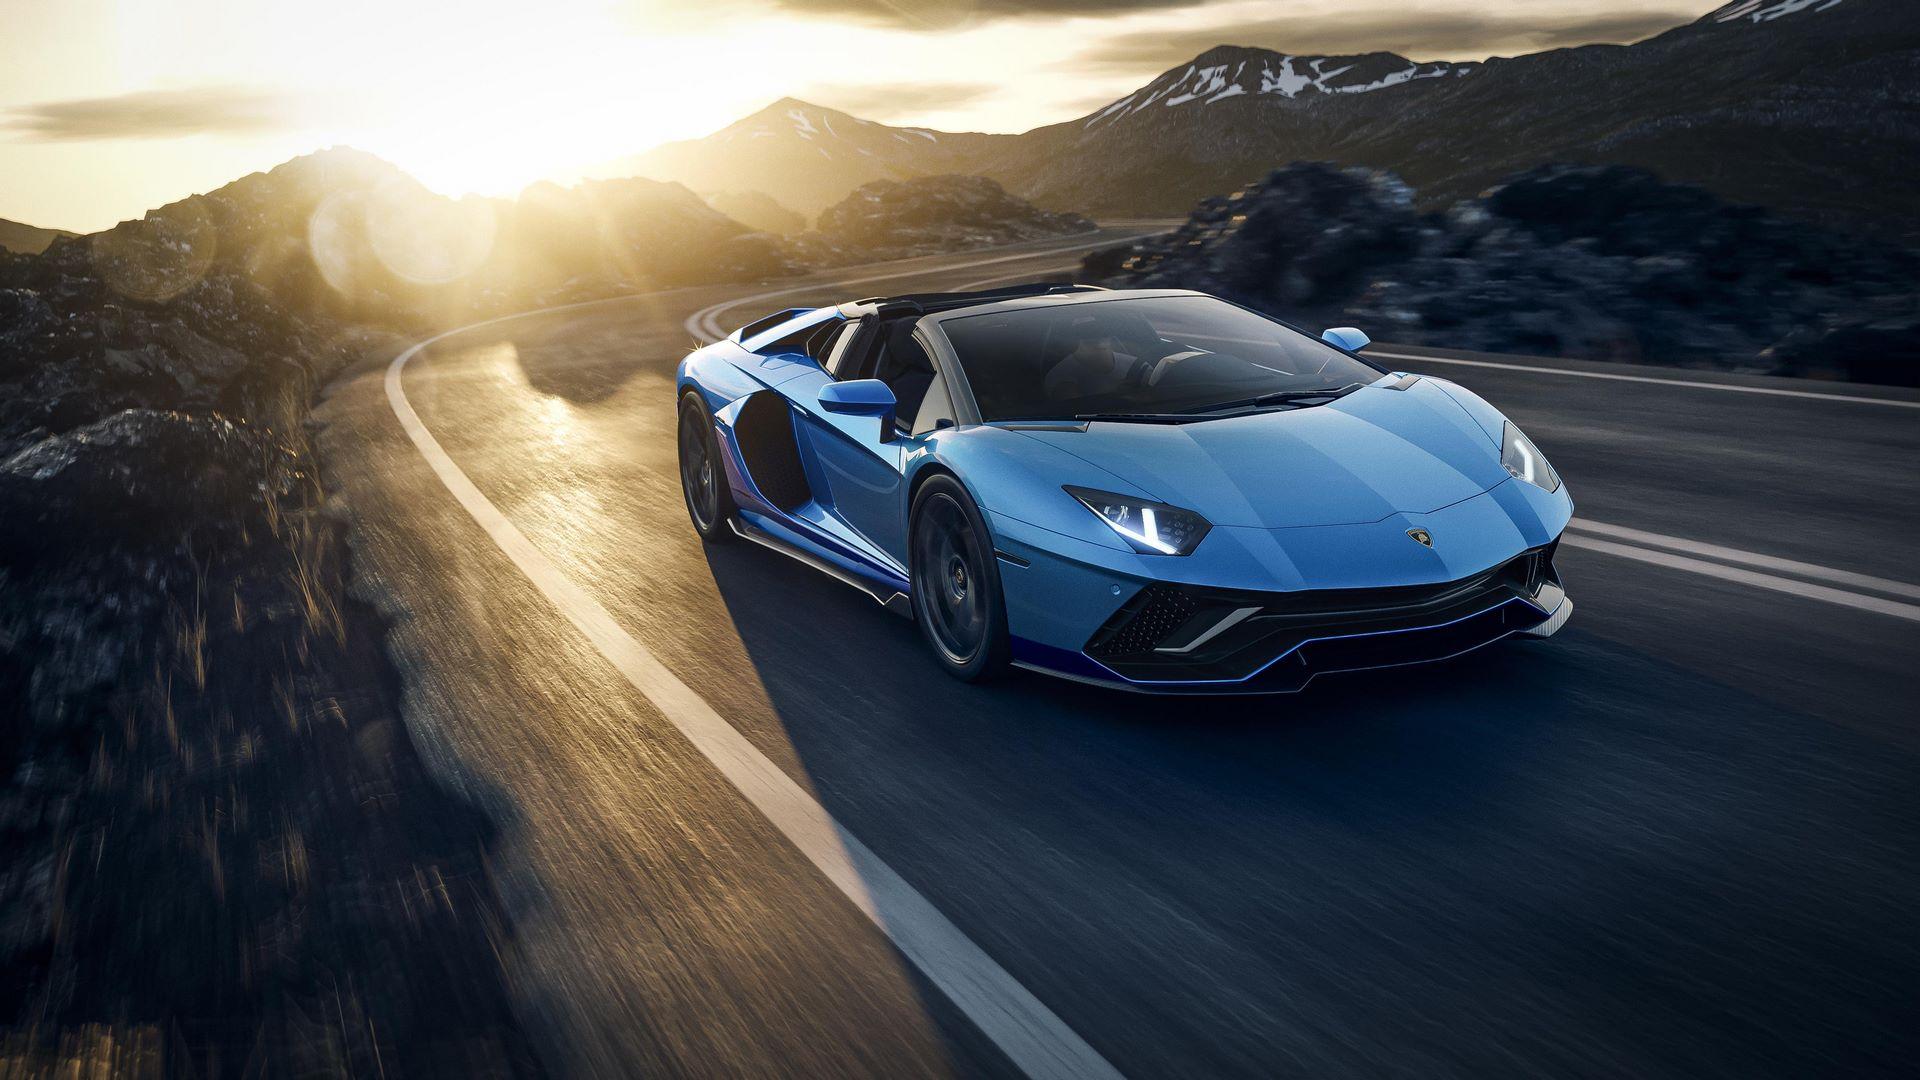 Lamborghini-Aventador-LP780-4-Ultimae-22